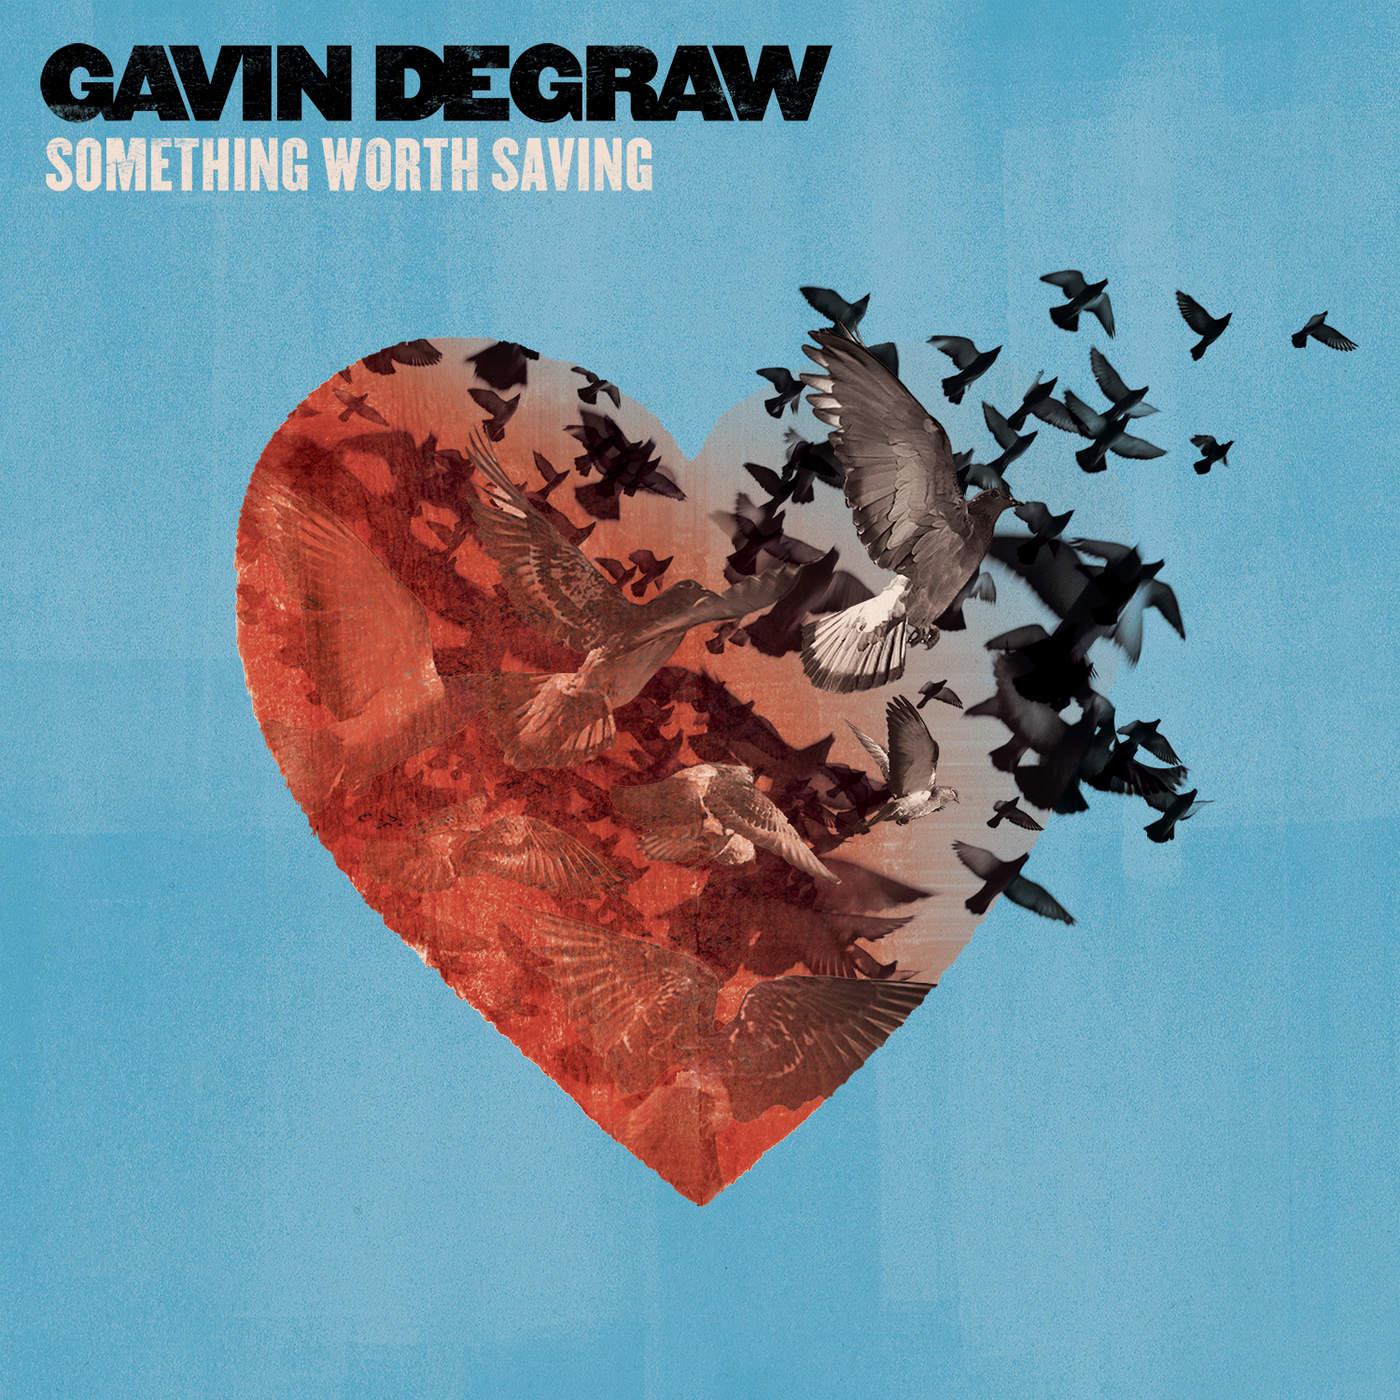 Gavin DeGraw - Something Worth Saving Cover